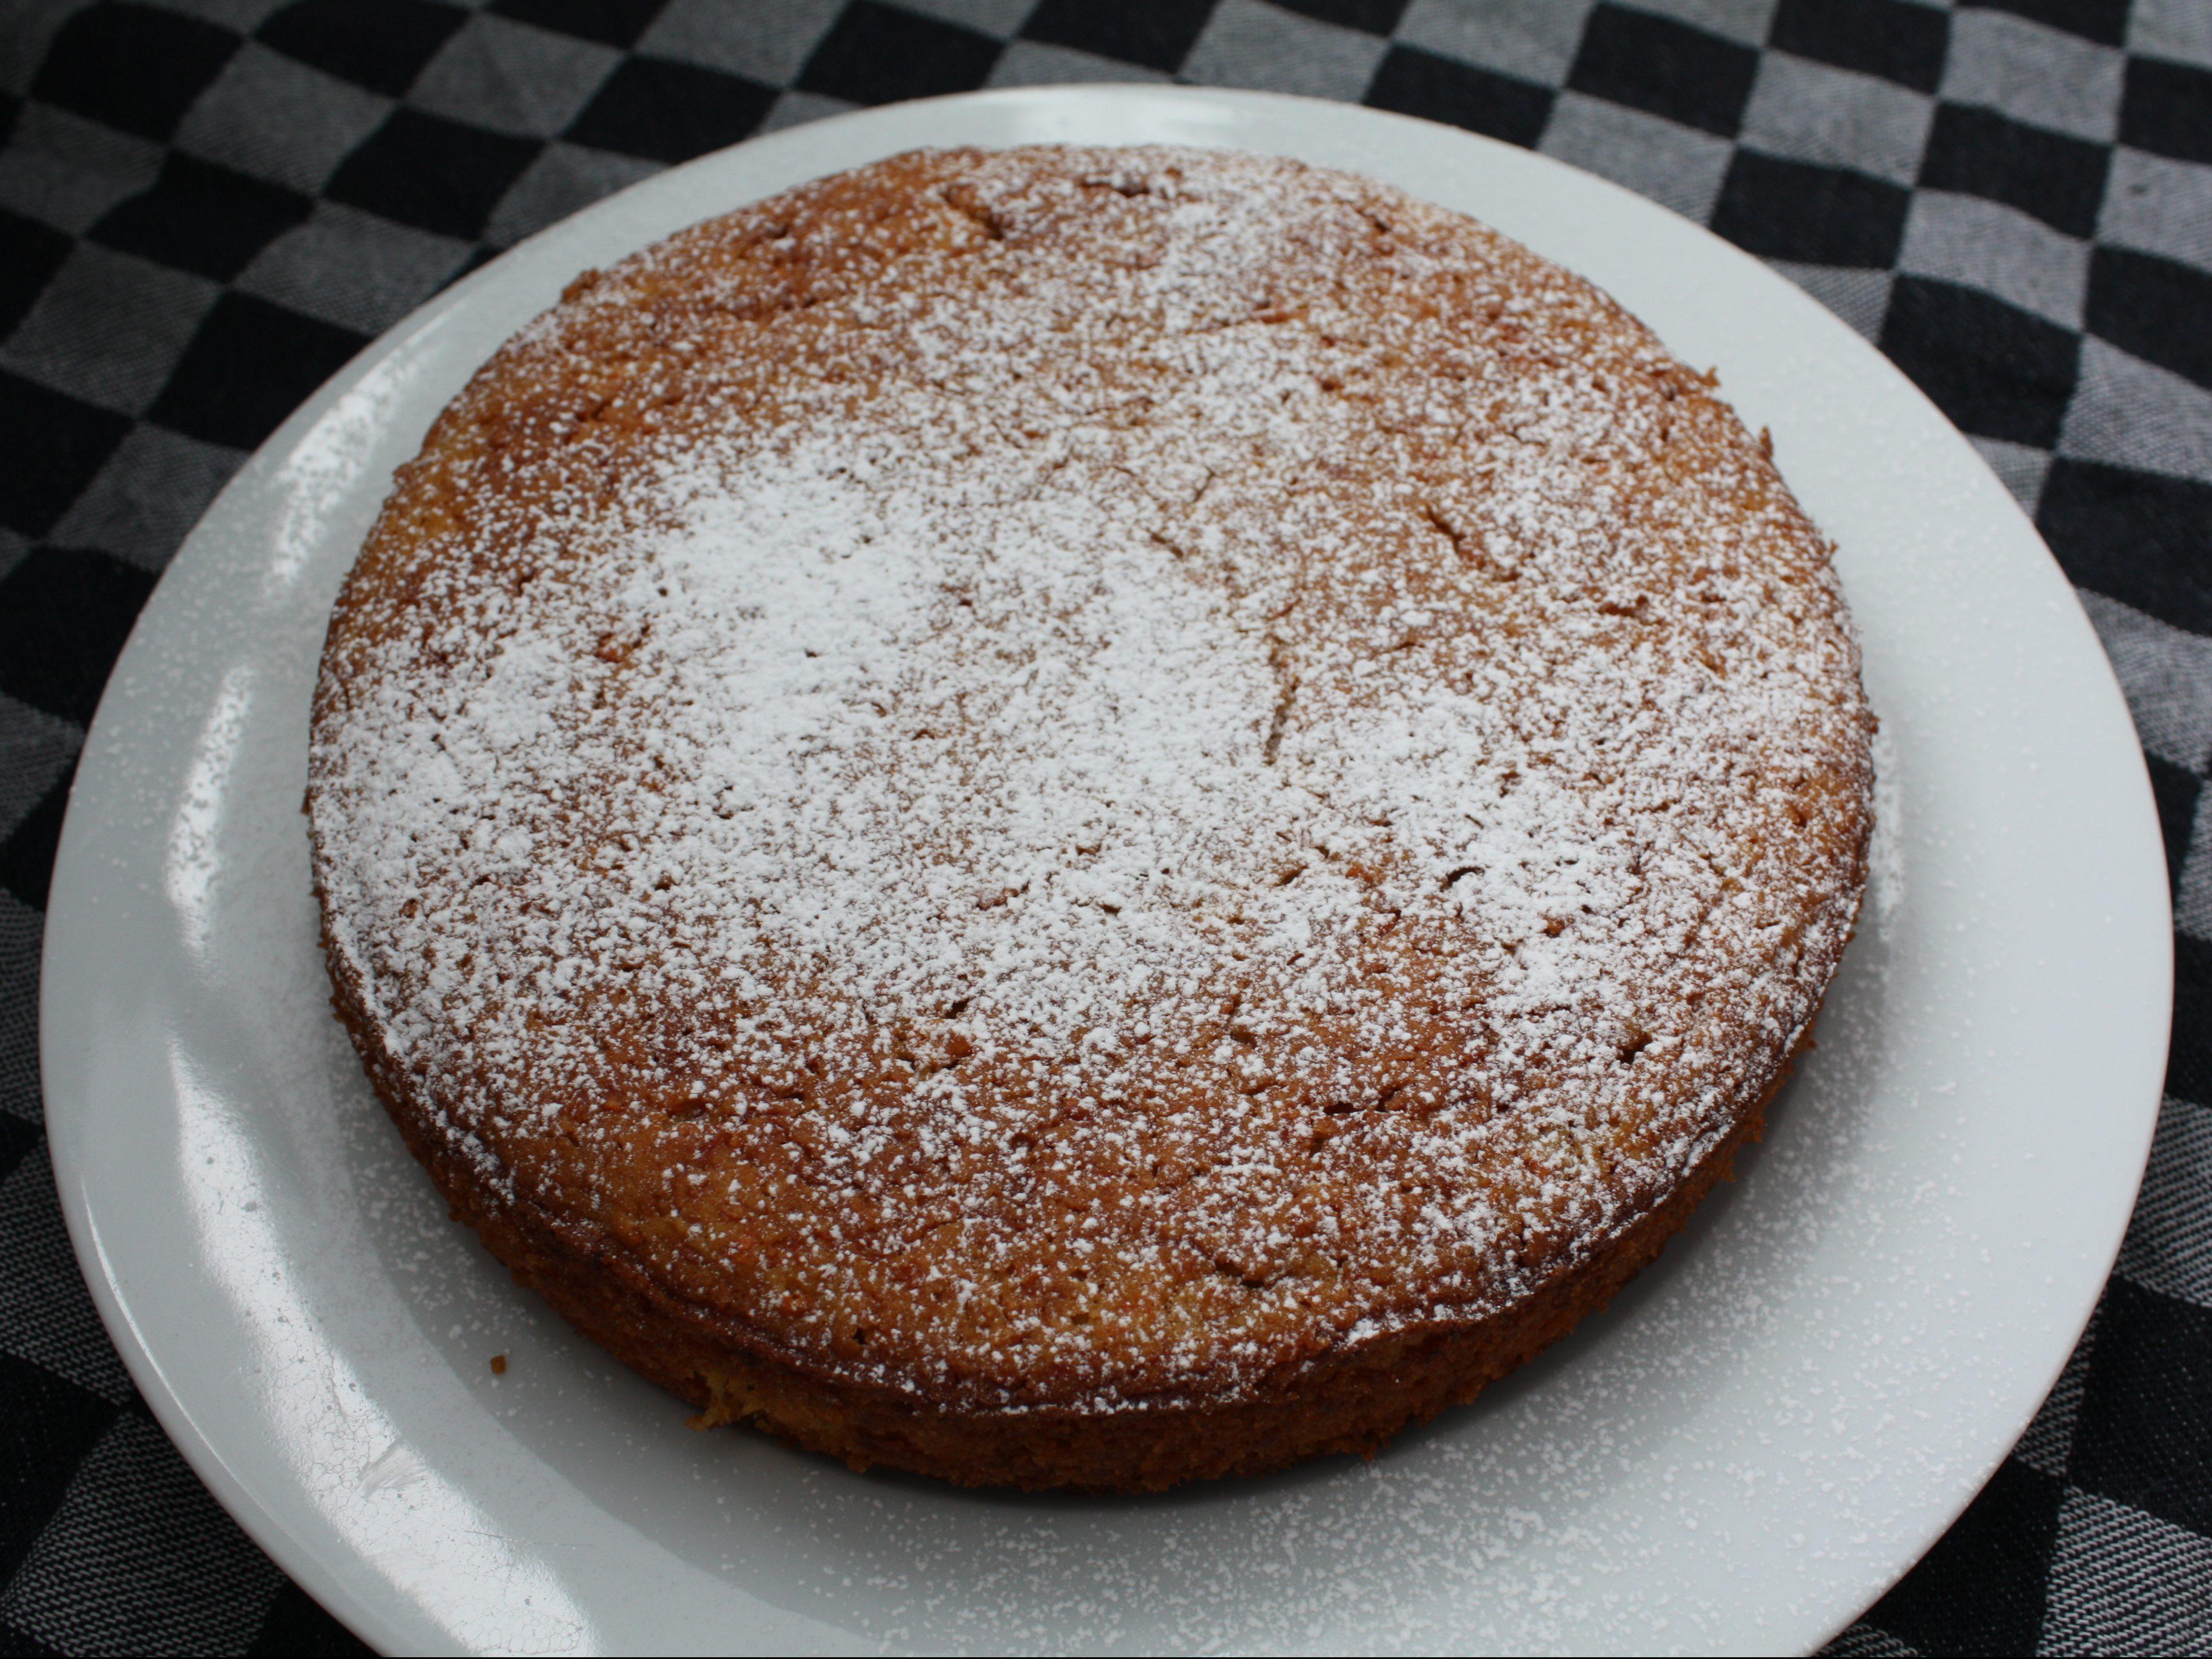 Gluten-free carrot almond cake